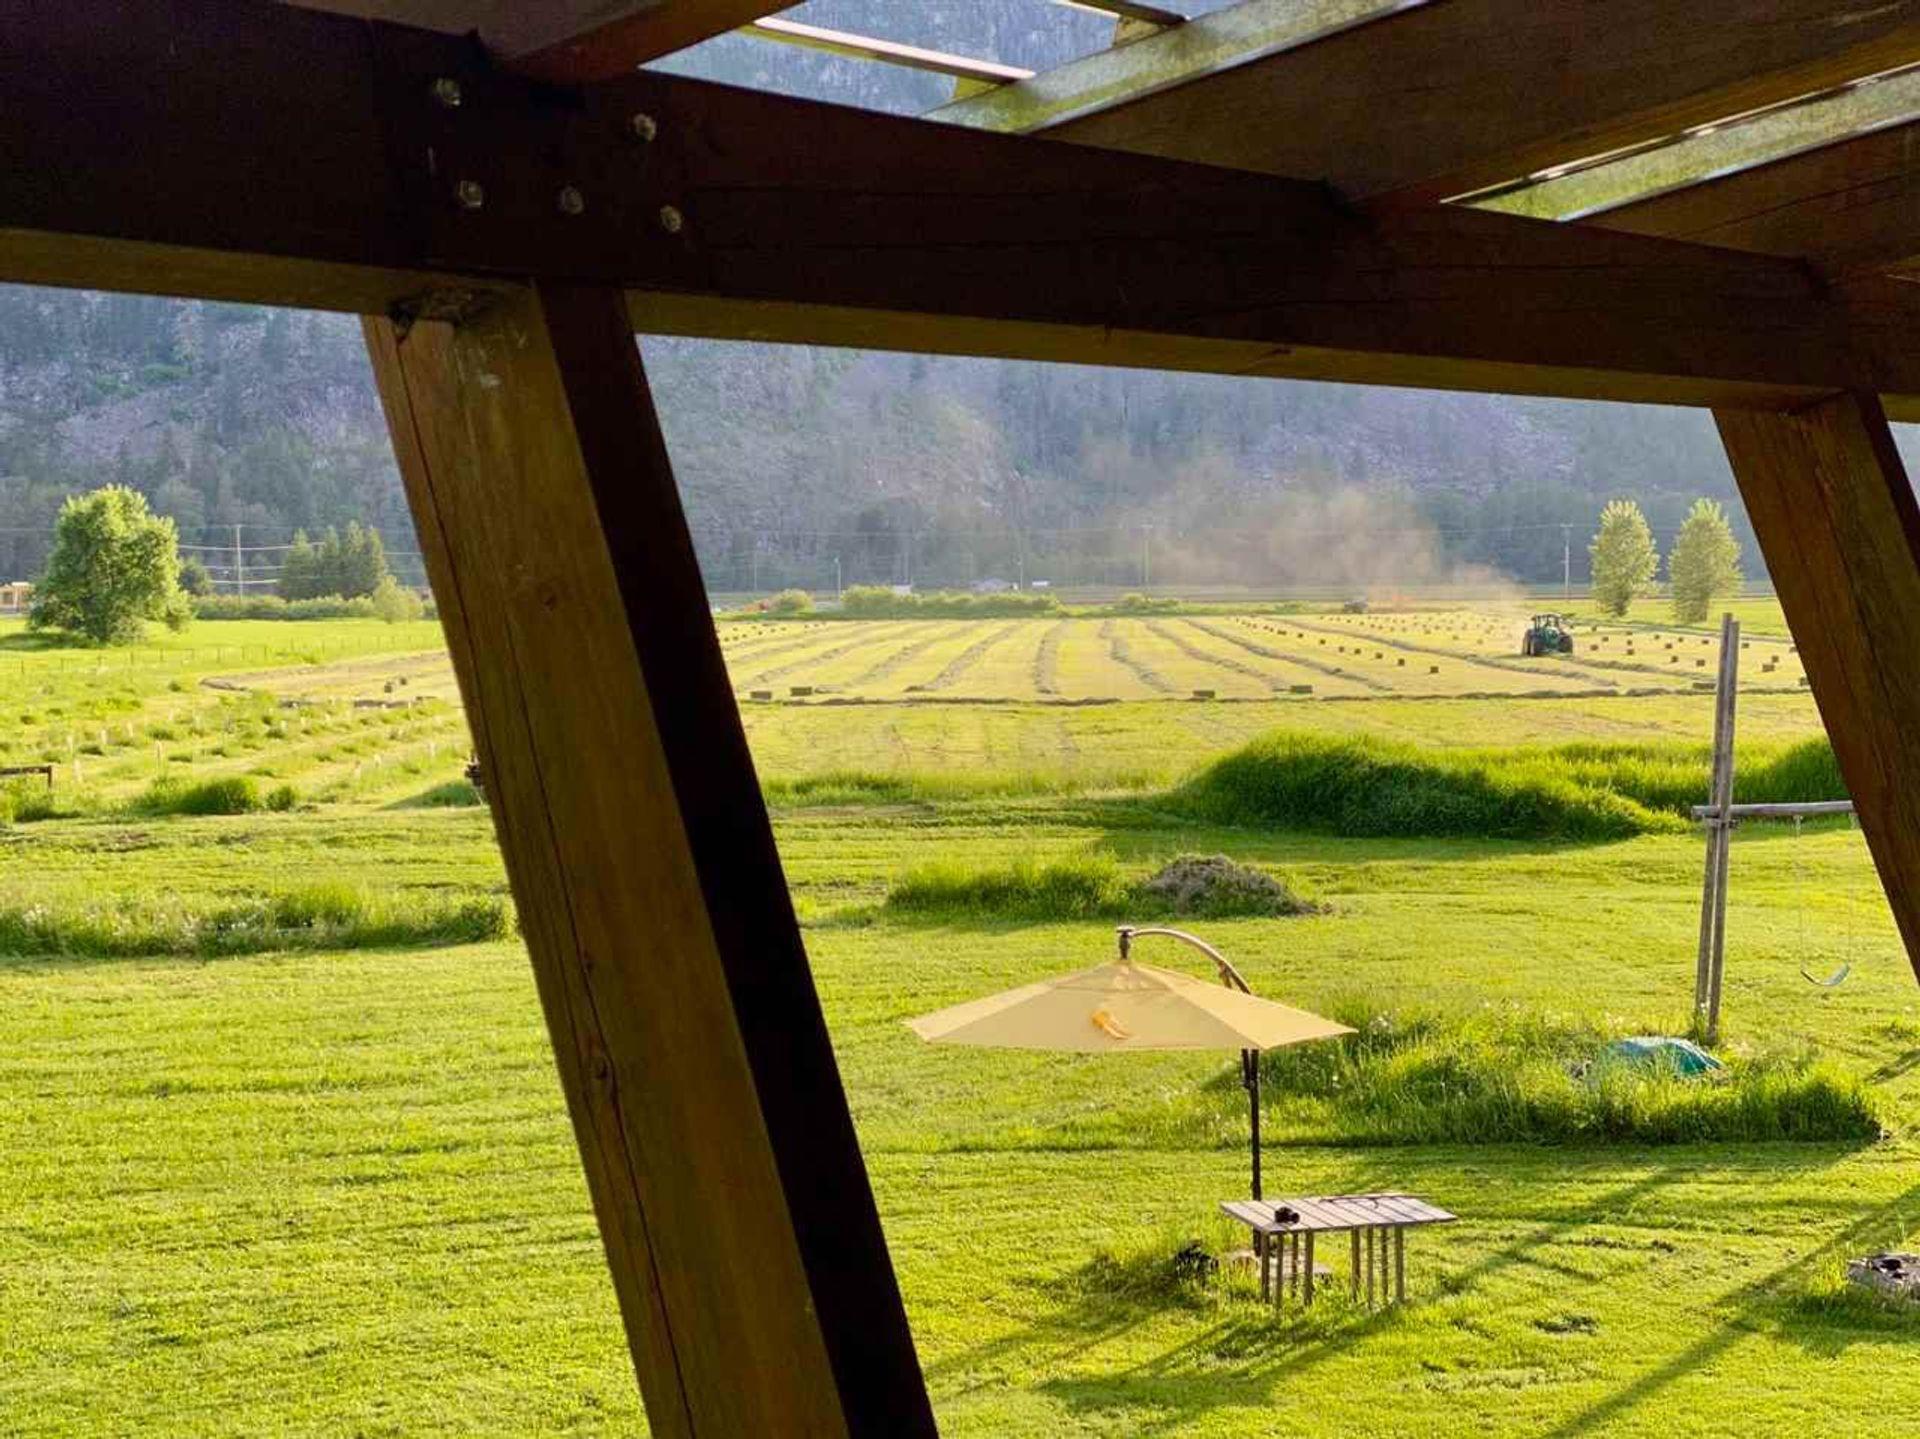 390-dill-road-pemberton-meadows-pemberton-13 at 390 Dill Road, Pemberton Meadows, Pemberton